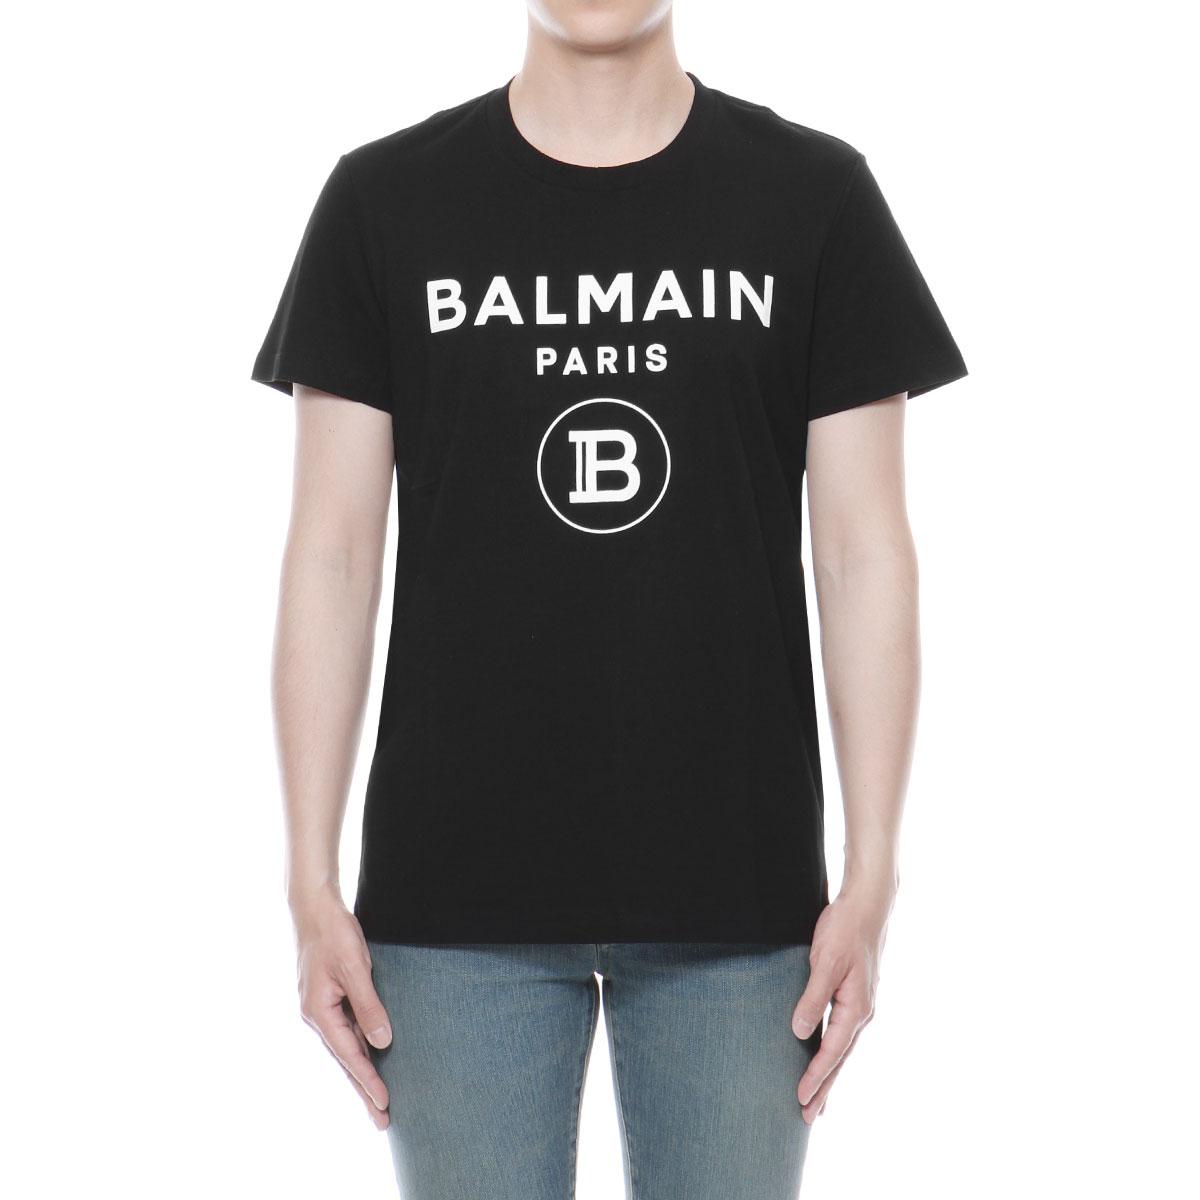 BALMAIN バルマン | 半袖Tシャツ